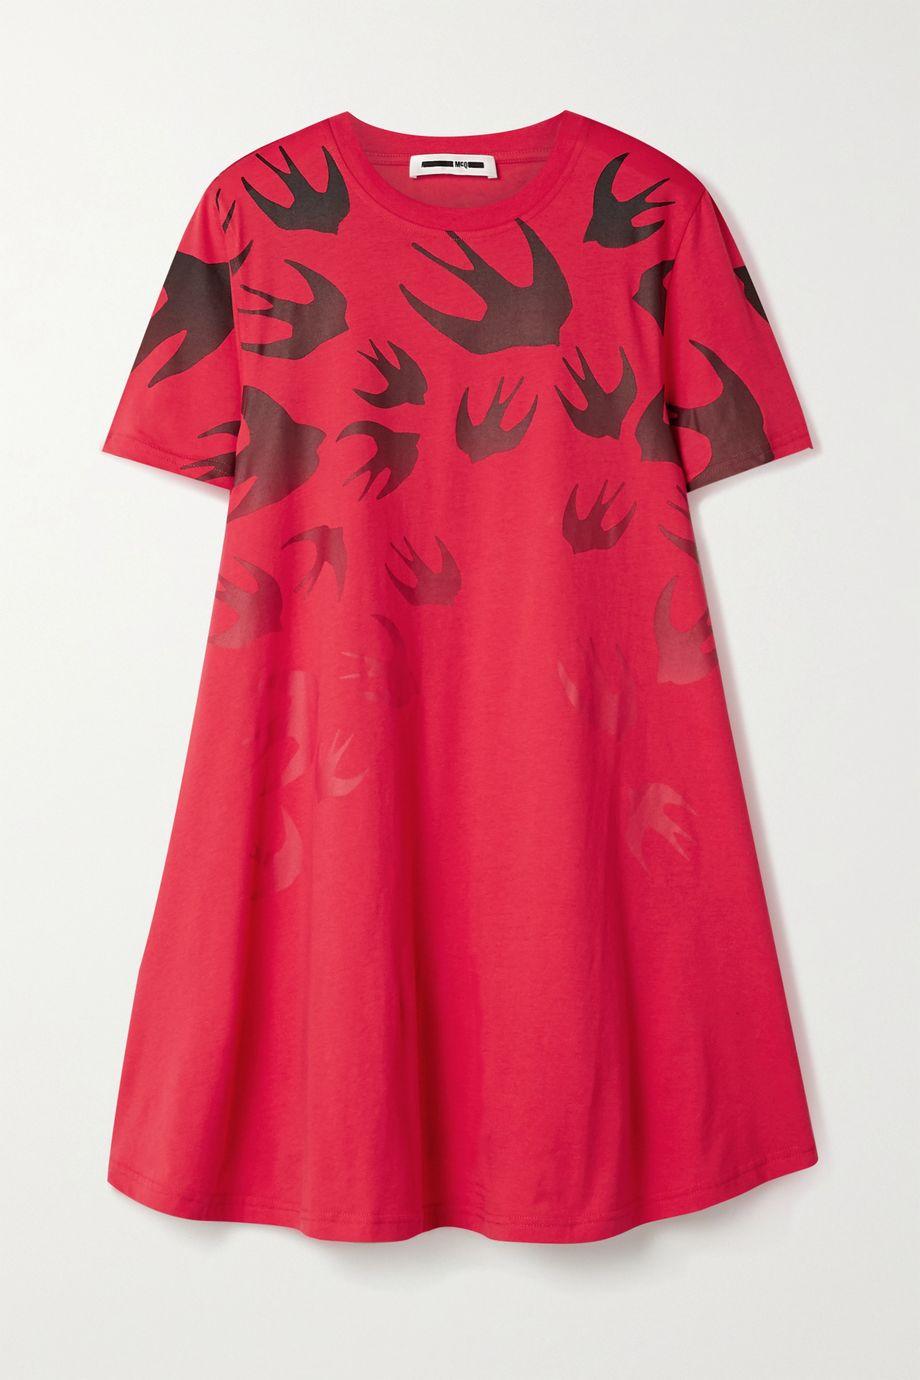 McQ Alexander McQueen Printed cotton-jersey mini dress